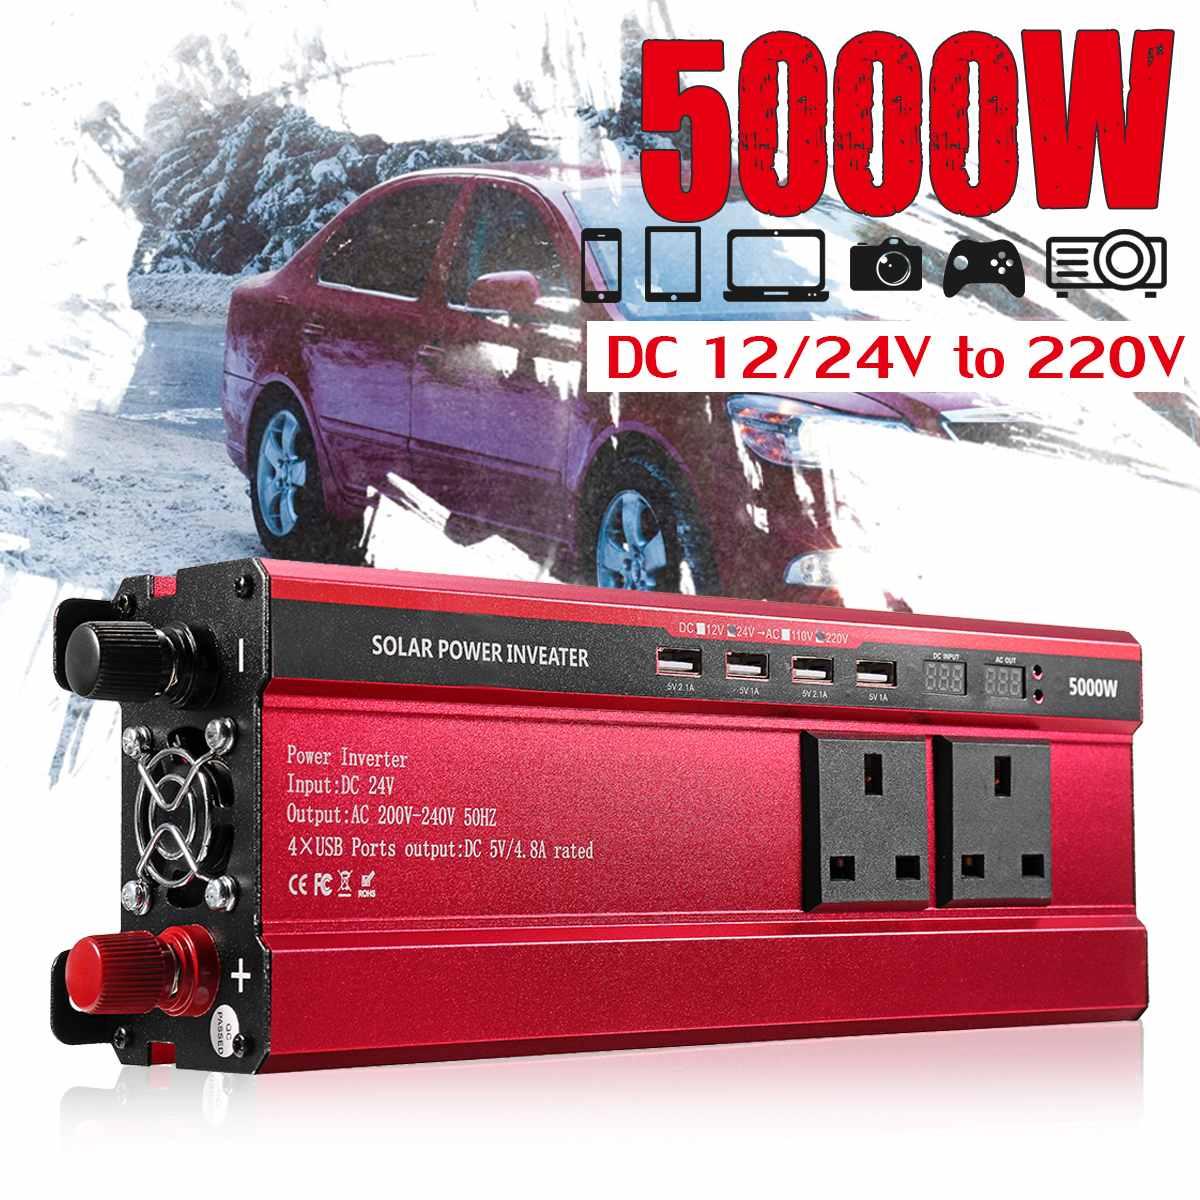 Autoleader 5000W พลังงานแสงอาทิตย์อินเวอร์เตอร์ DC 12 V/24 V To AC 110 V/220 V ดัดแปลง sine Wave Converter สำหรับรถและรถบรรทุก